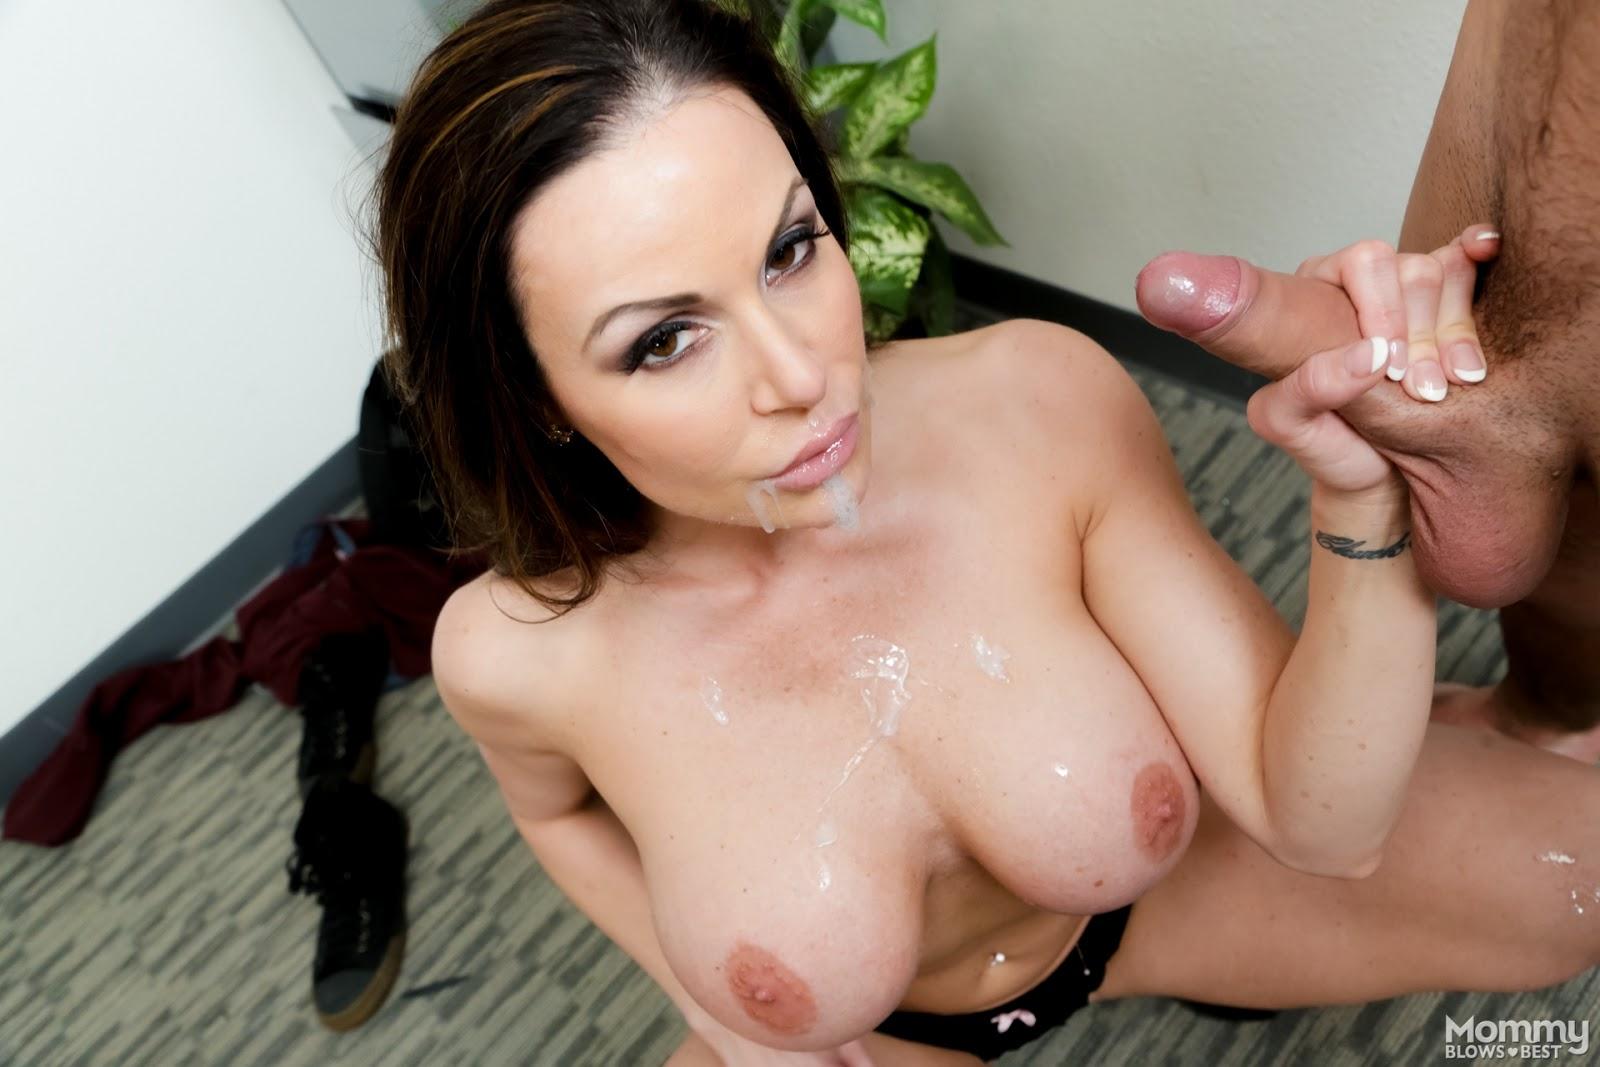 store bløde bryster massage odense sex